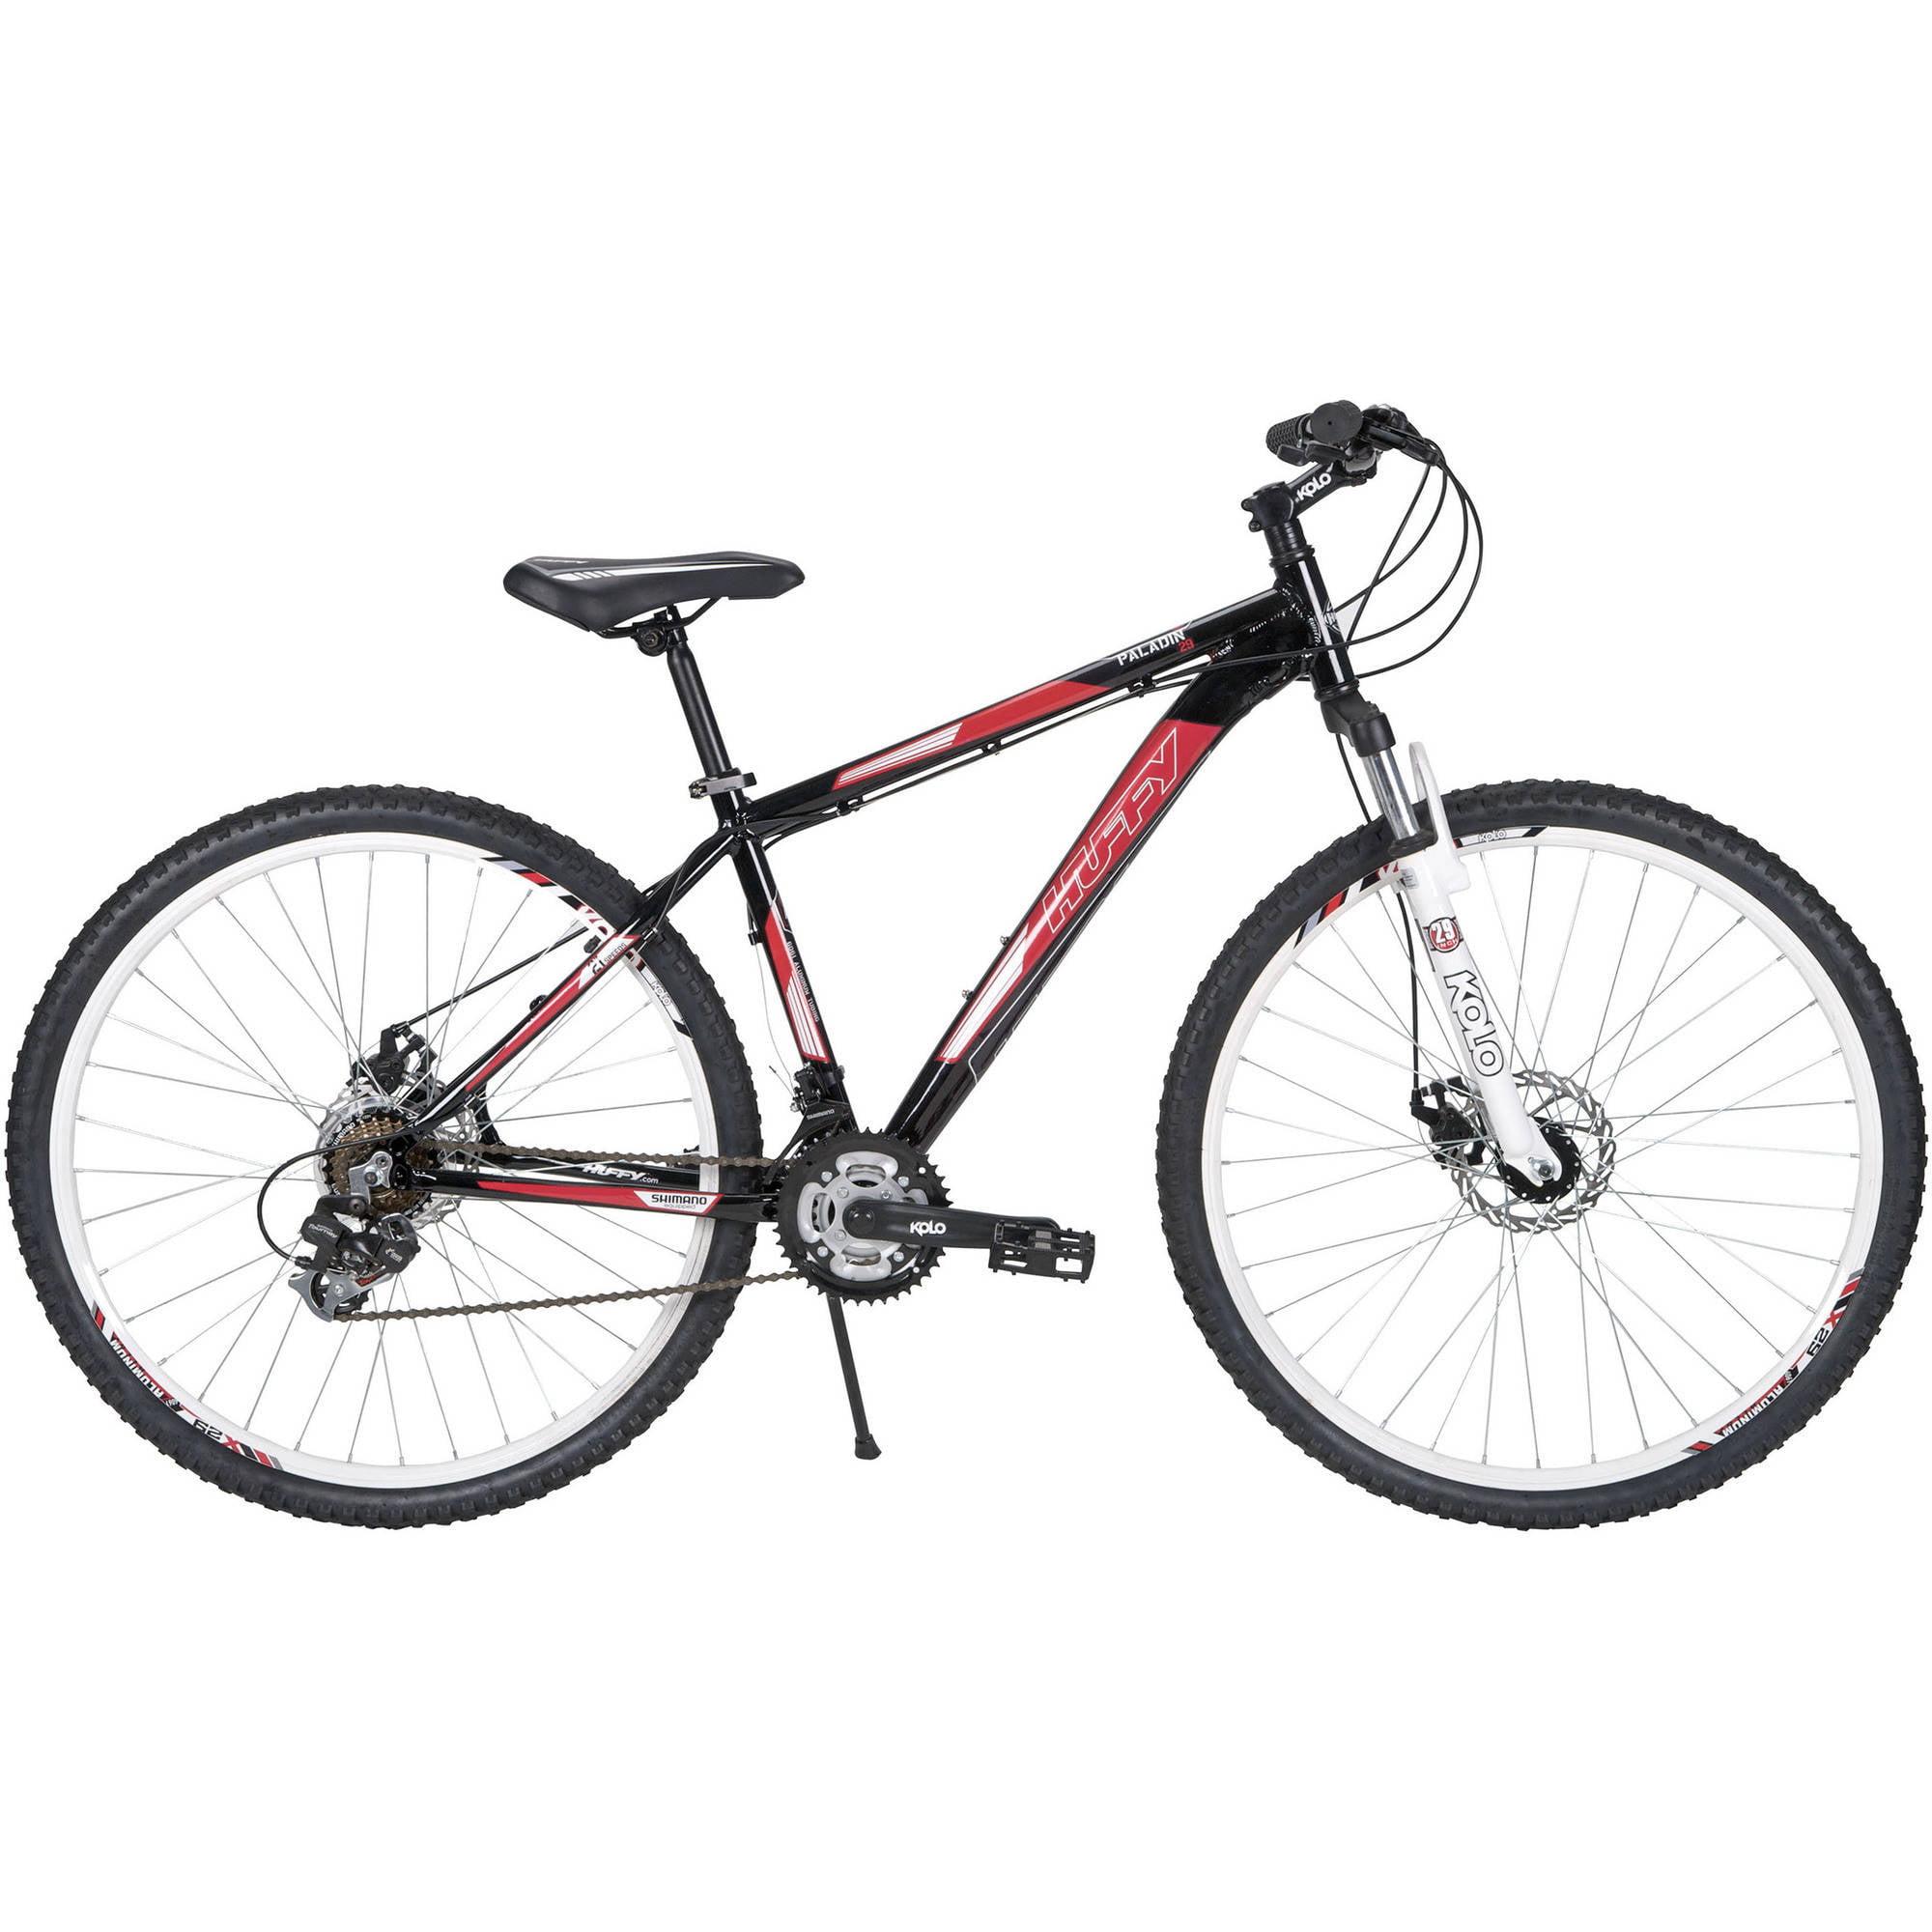 "29"" Huffy Phalanx Men's Mountain Bike, Black"